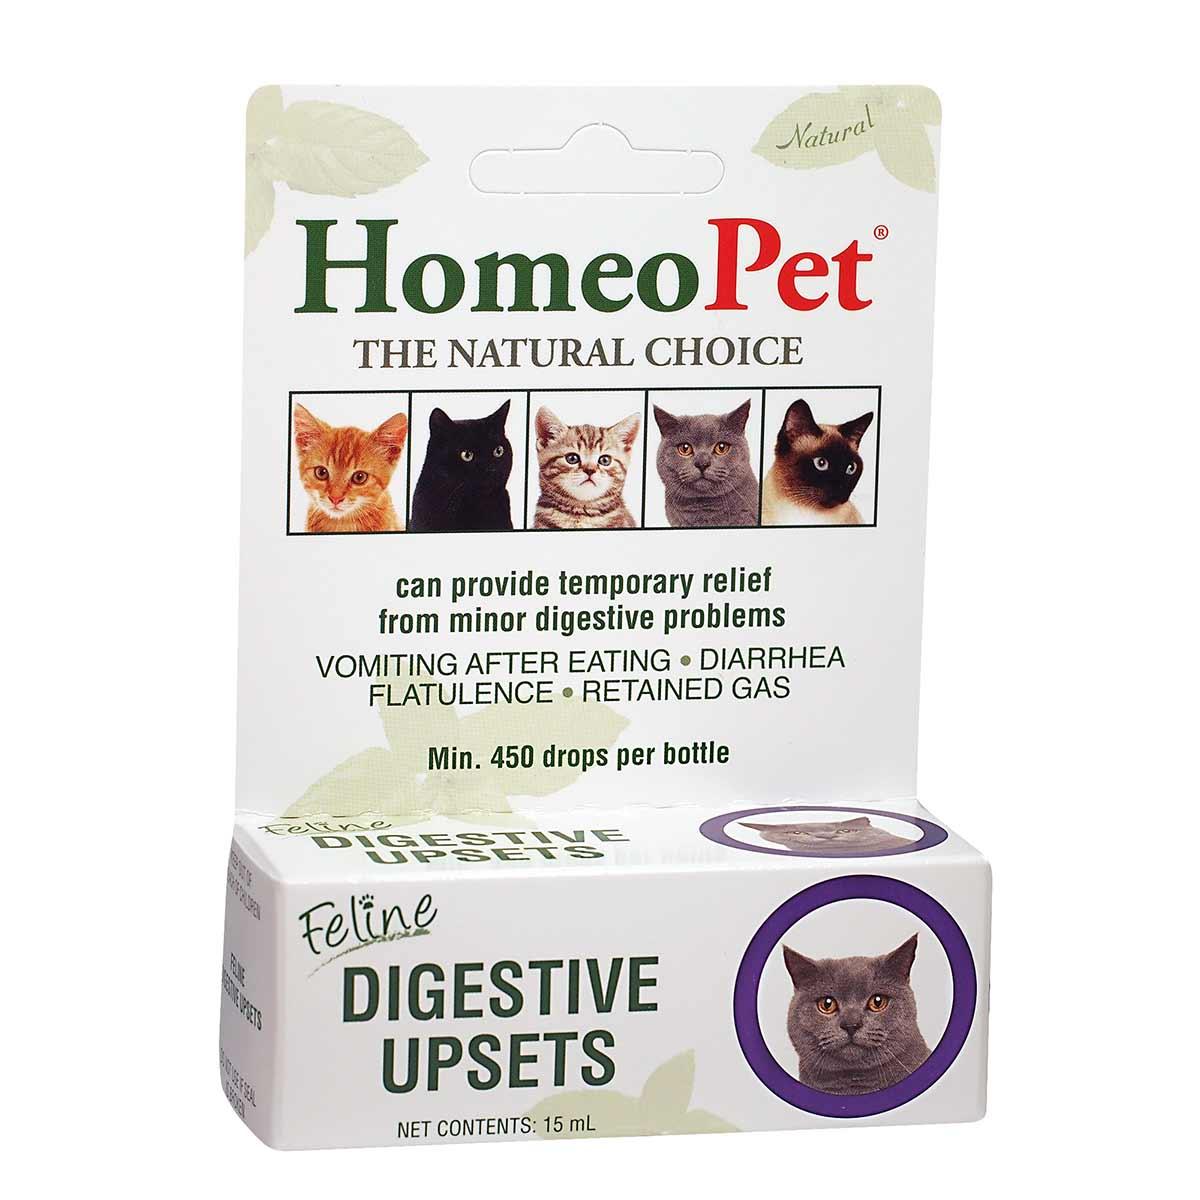 Homeopet Feline Digestive Upsets Supplement